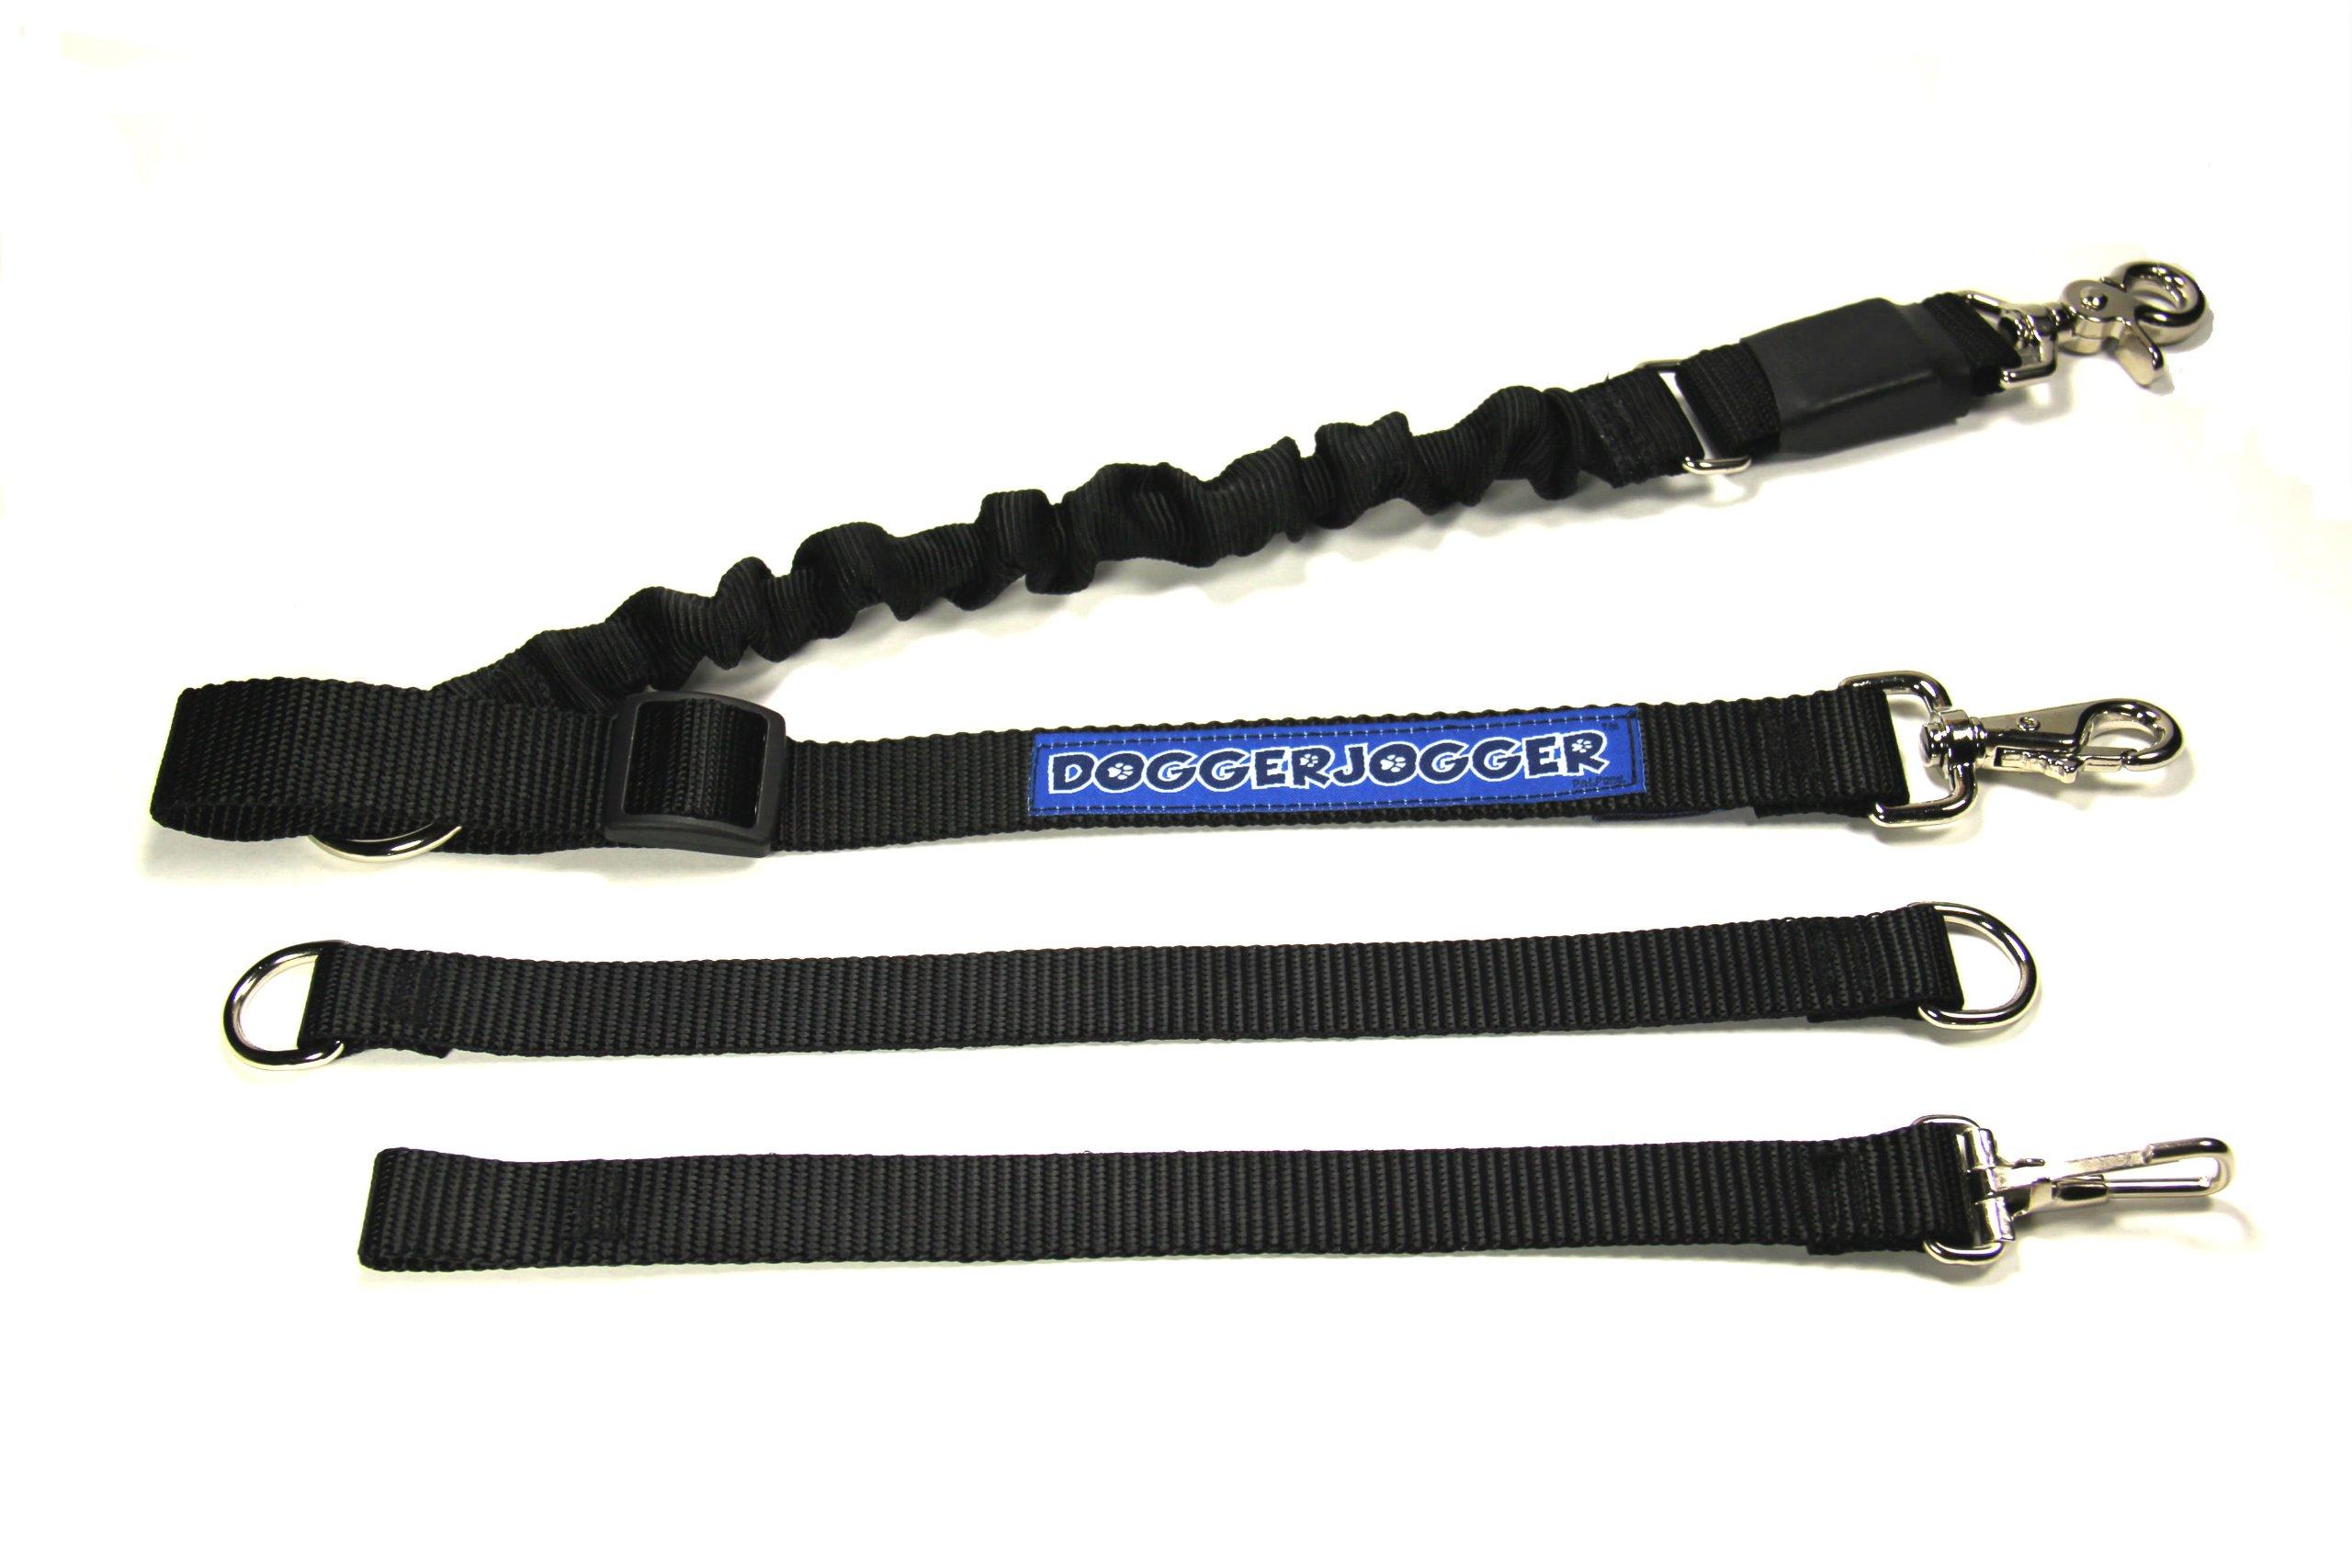 DoggerJogger Bike Dog Leash (Black)